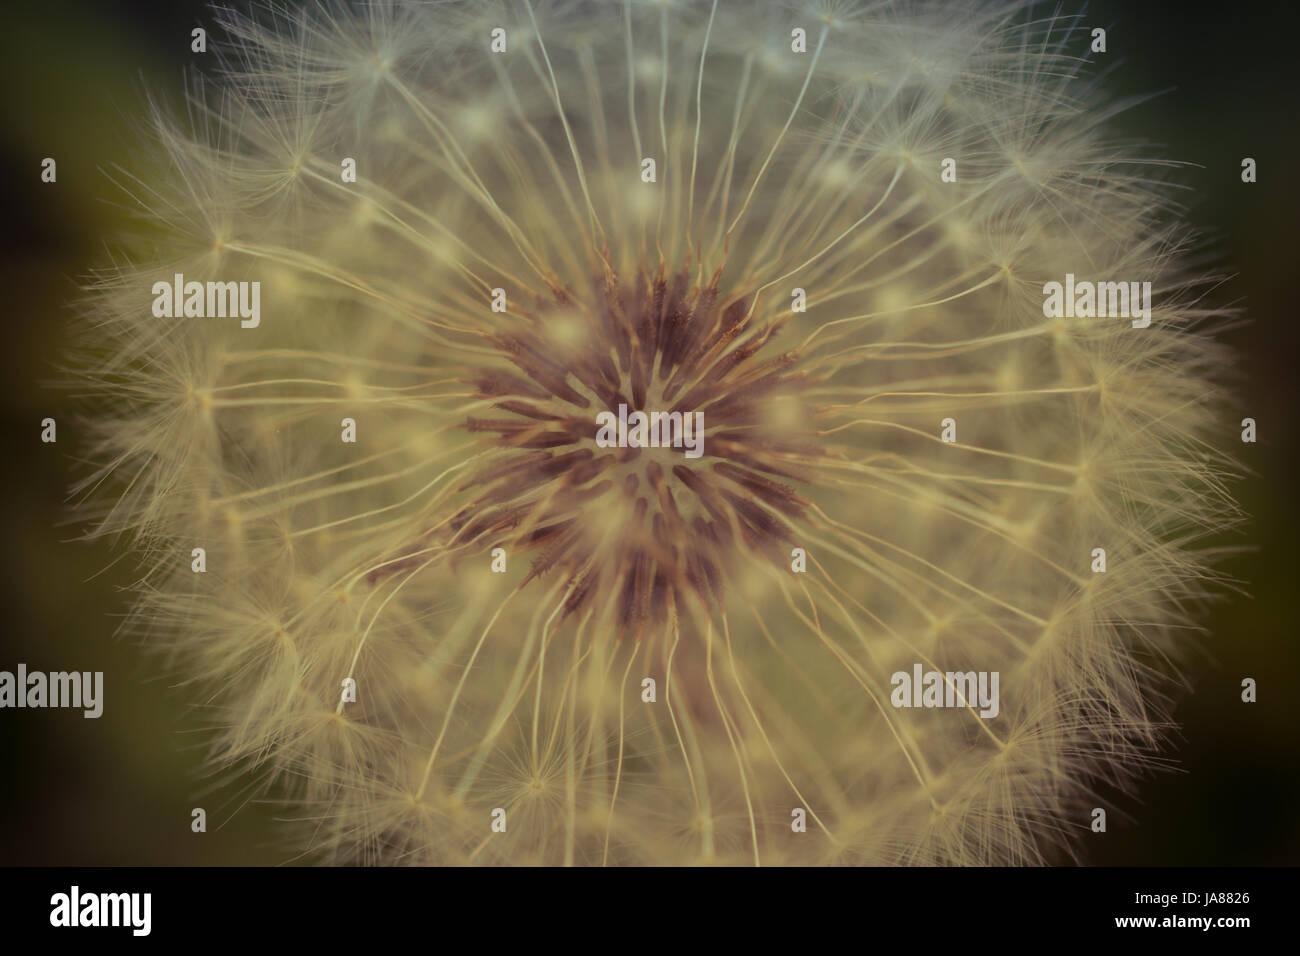 Dandelion Seed Head Macro - Stock Image